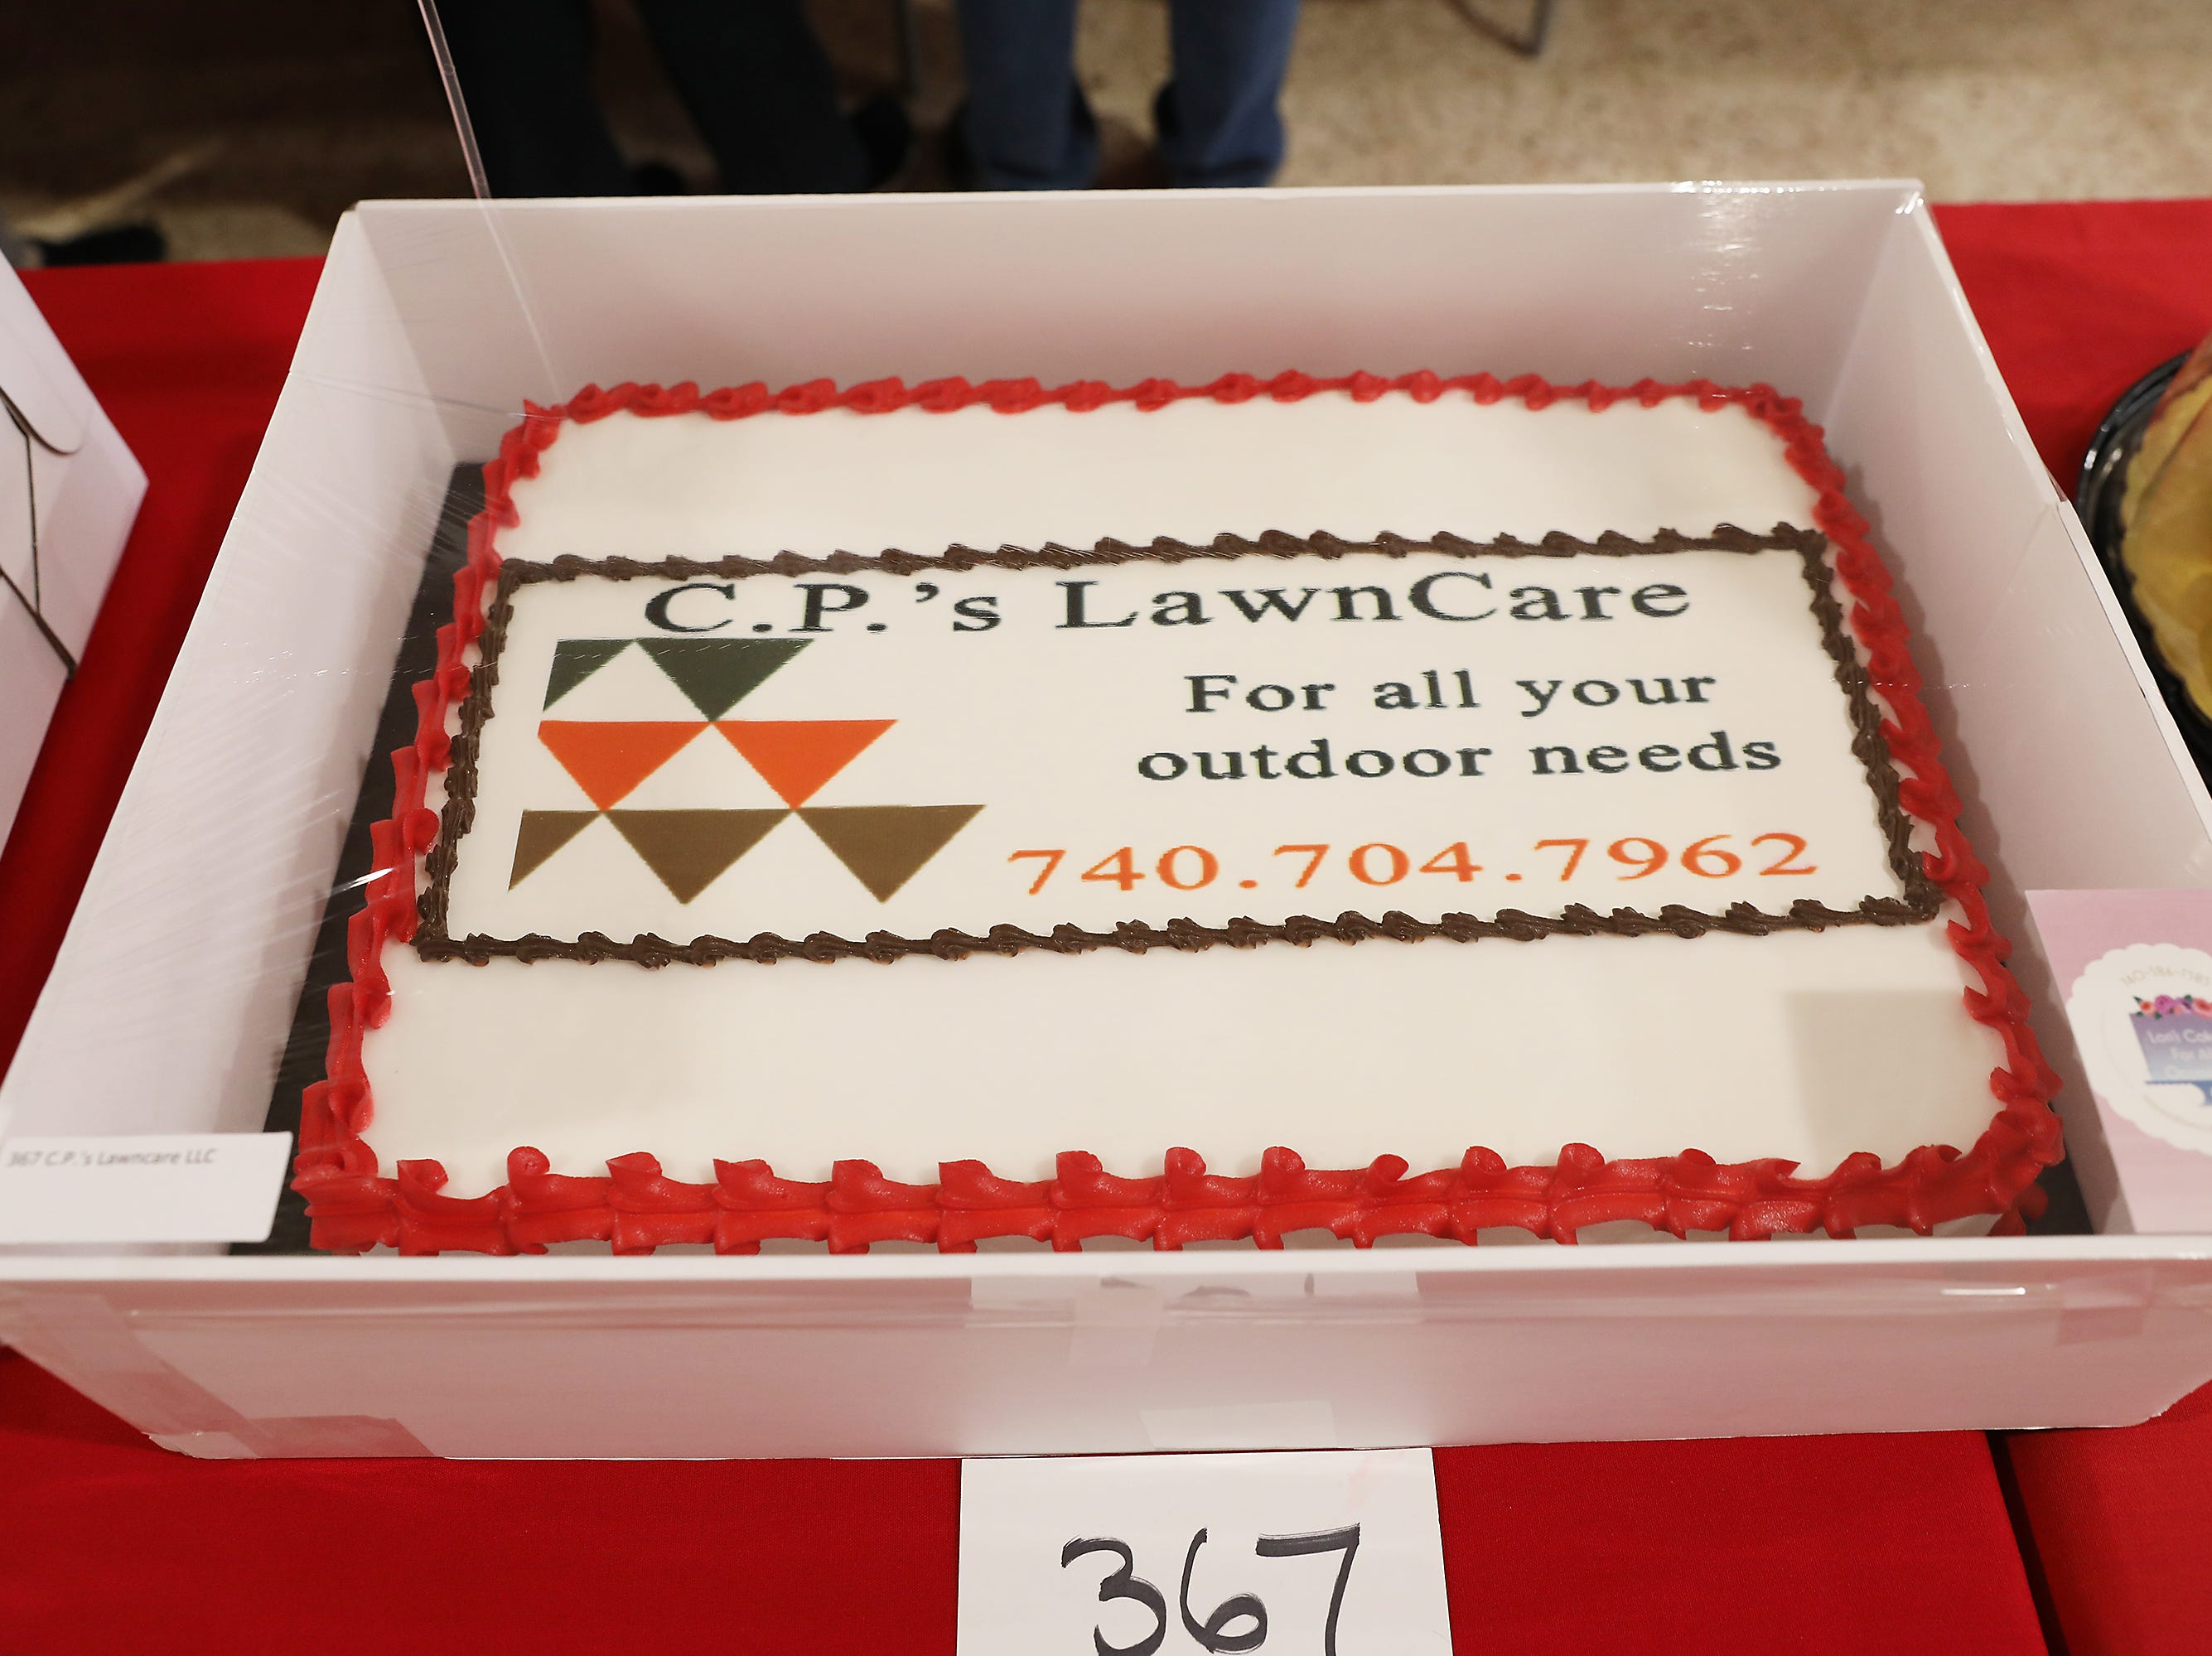 3:45 P.M. Friday cake 367 C.P.'s Lawncare LLC - 4 nights at The Place at Corkscrew, Estero, Florida; $1,400